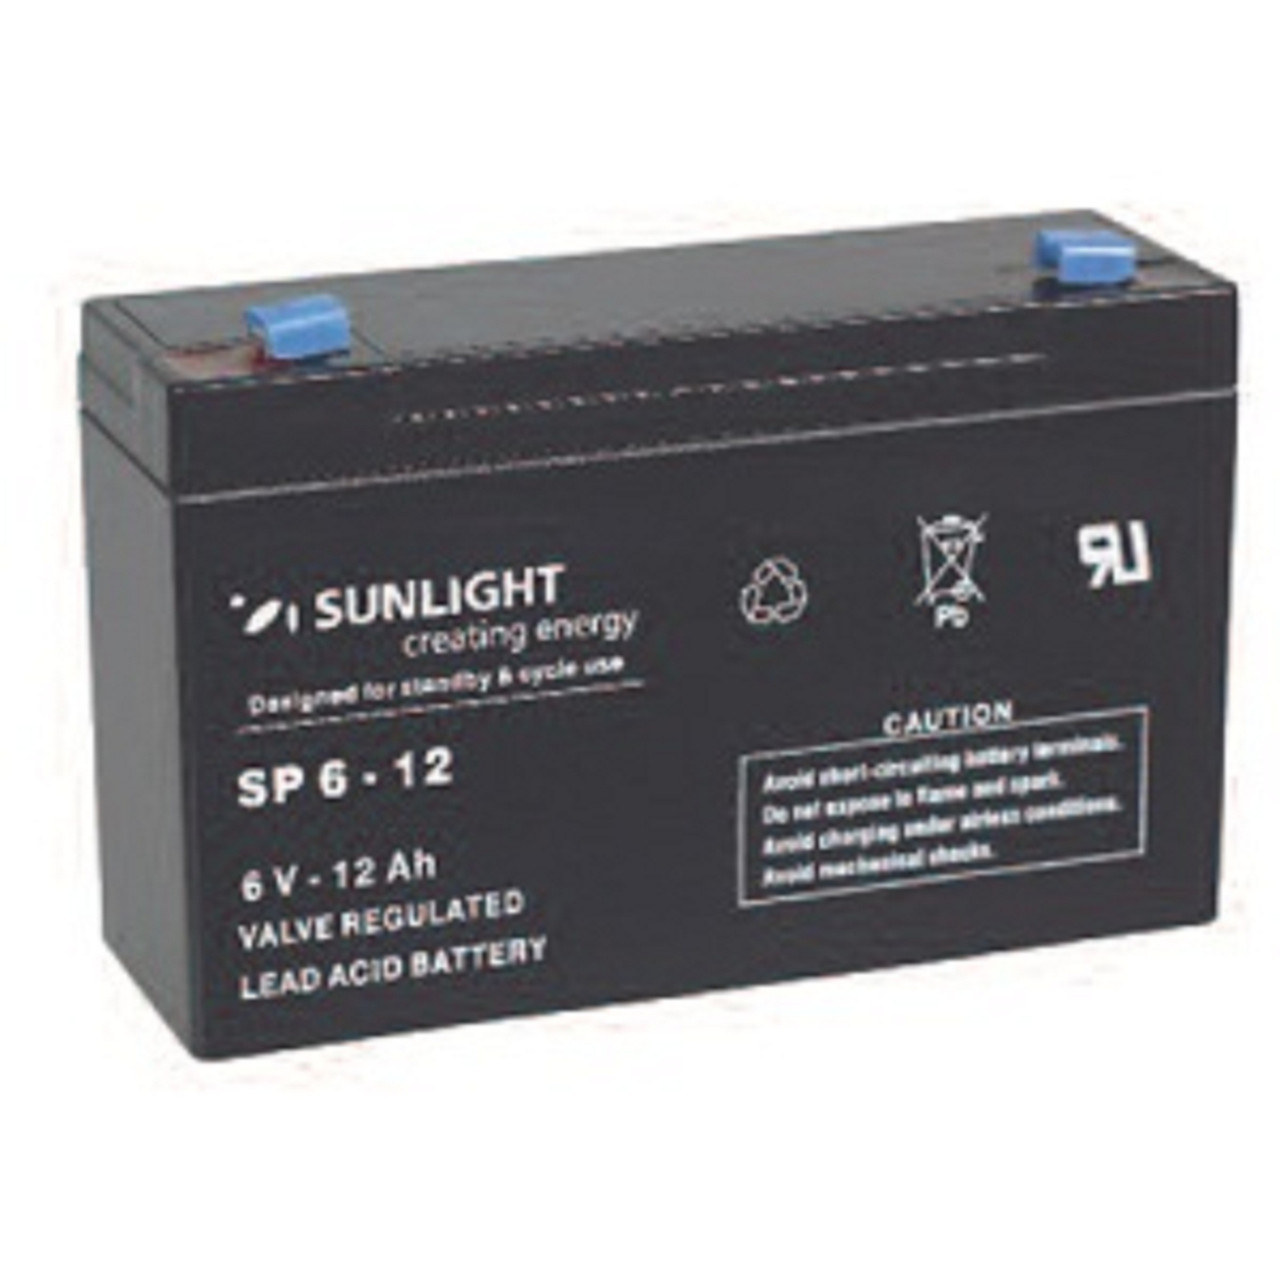 Аккумулятор 6 В, 12 Ач, Sunlight SP6-12